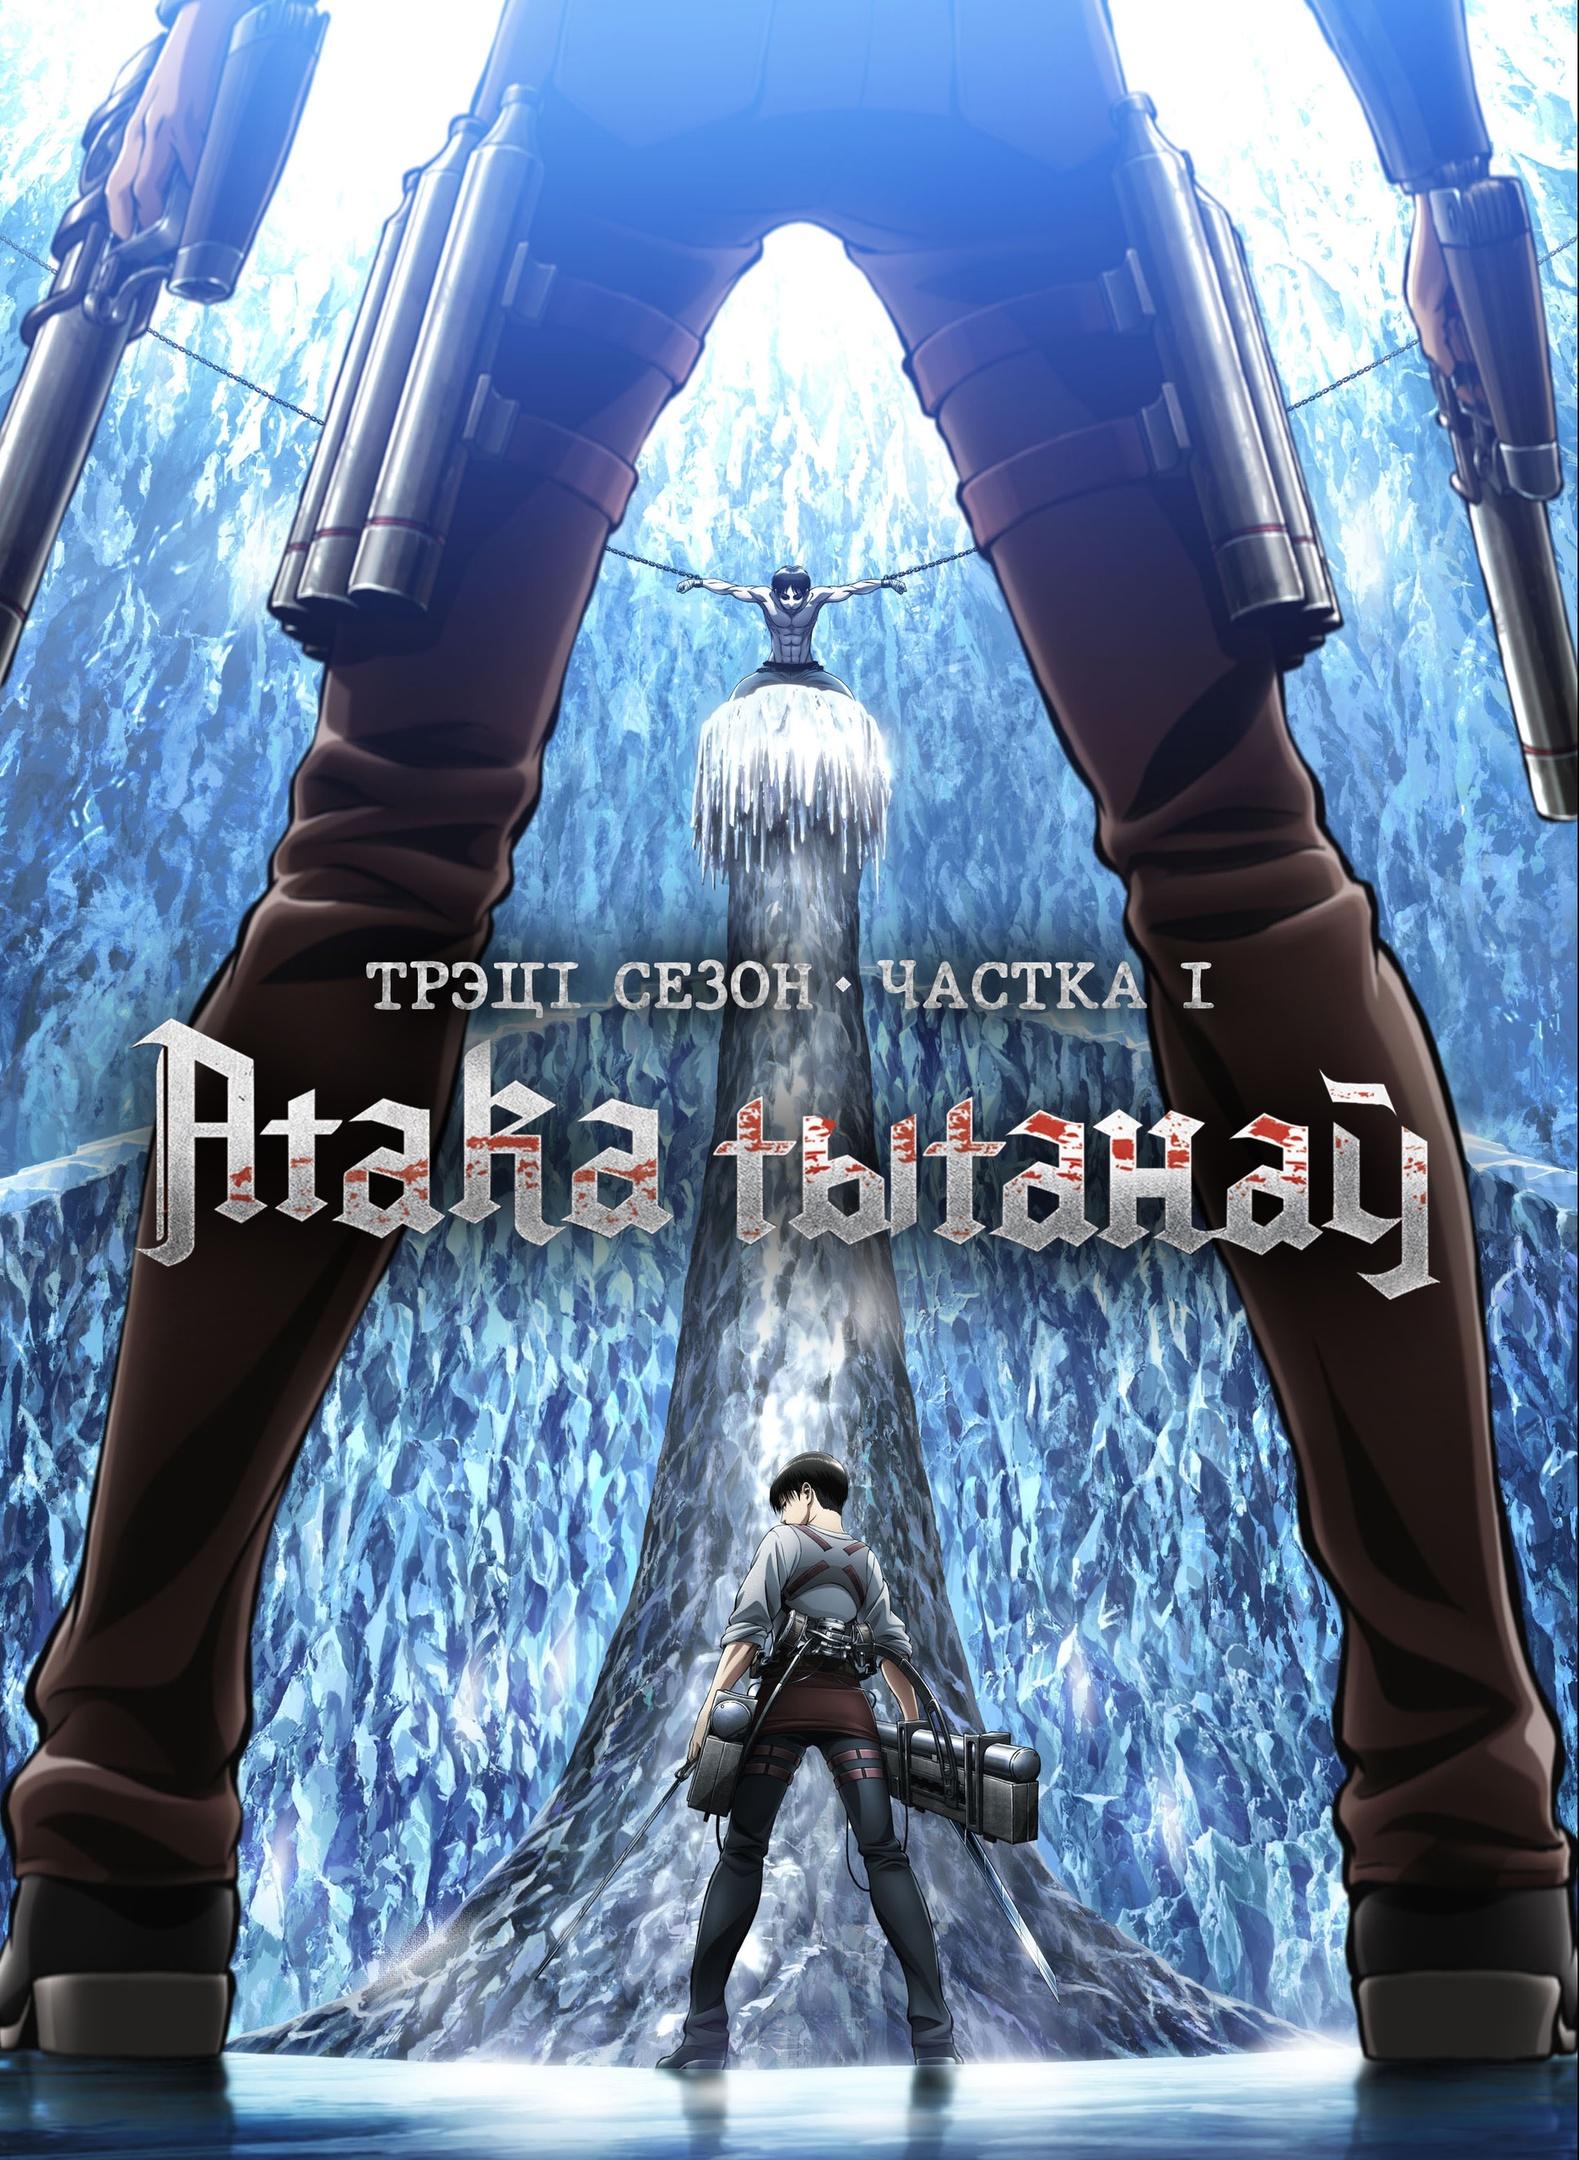 Shingeki no Kyojin Season 3 Part I, Атака тытанаў. Трэці сезон: Частка I, shingeki-no-kyojin-season-3-part-i